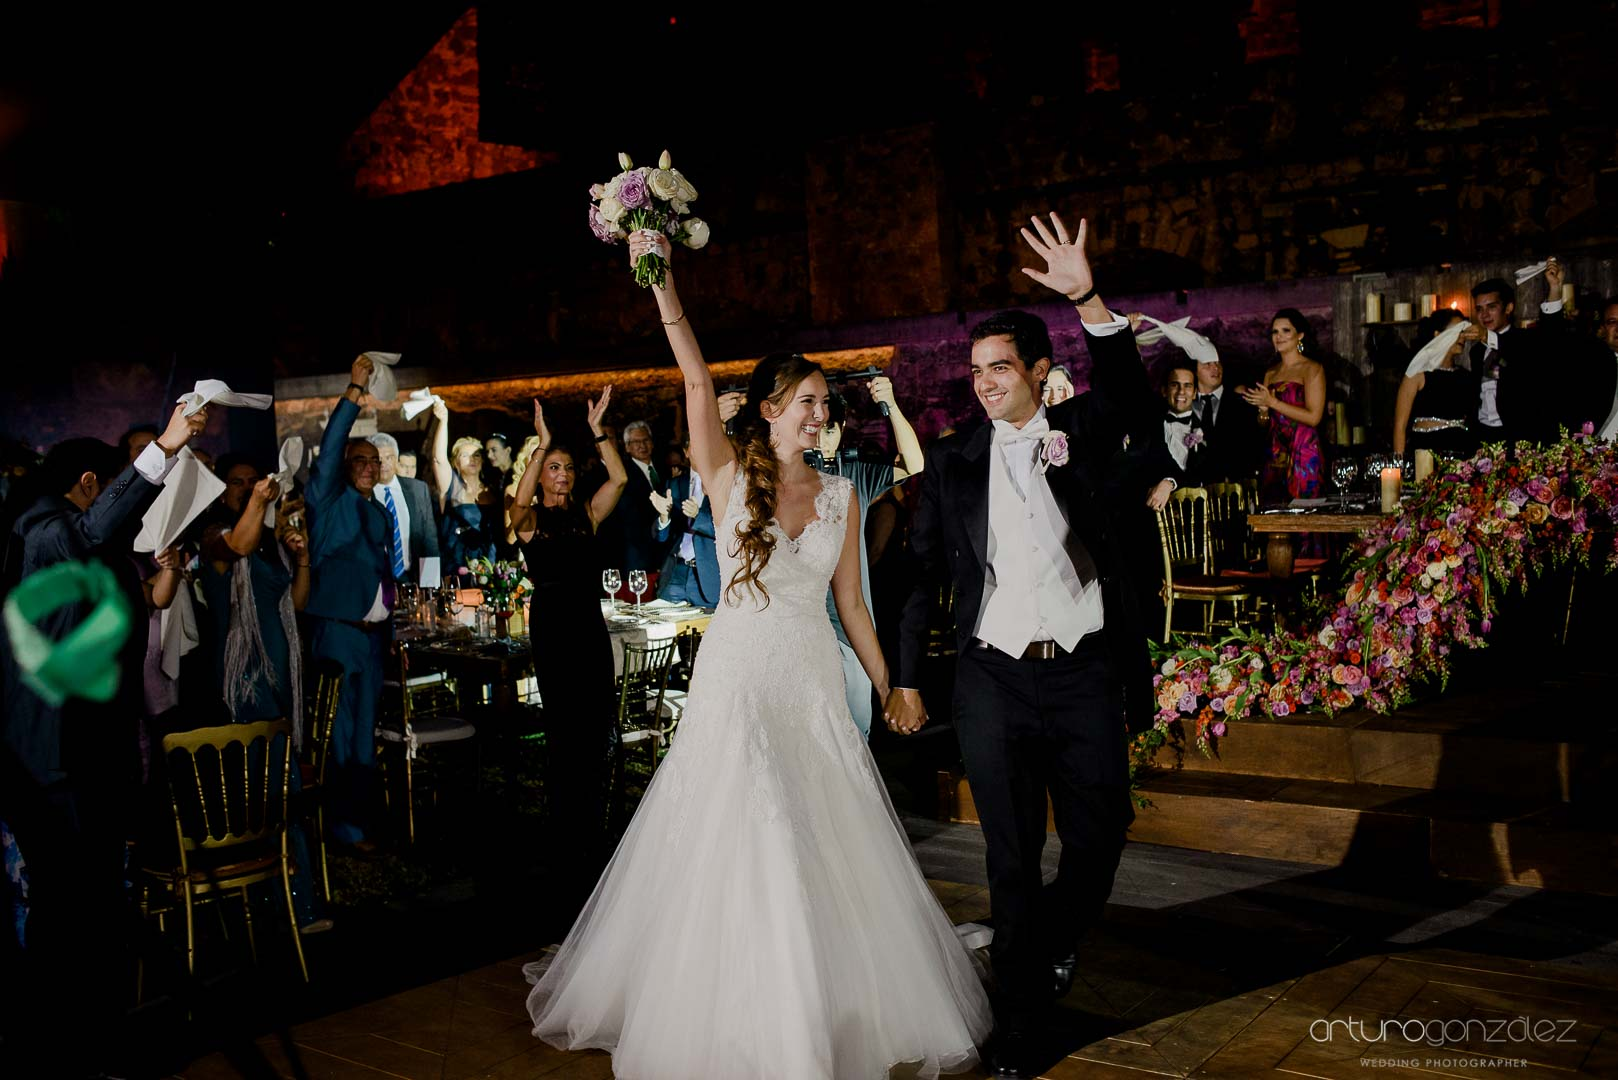 fotografo-de-bodas-en-guanajuato-107